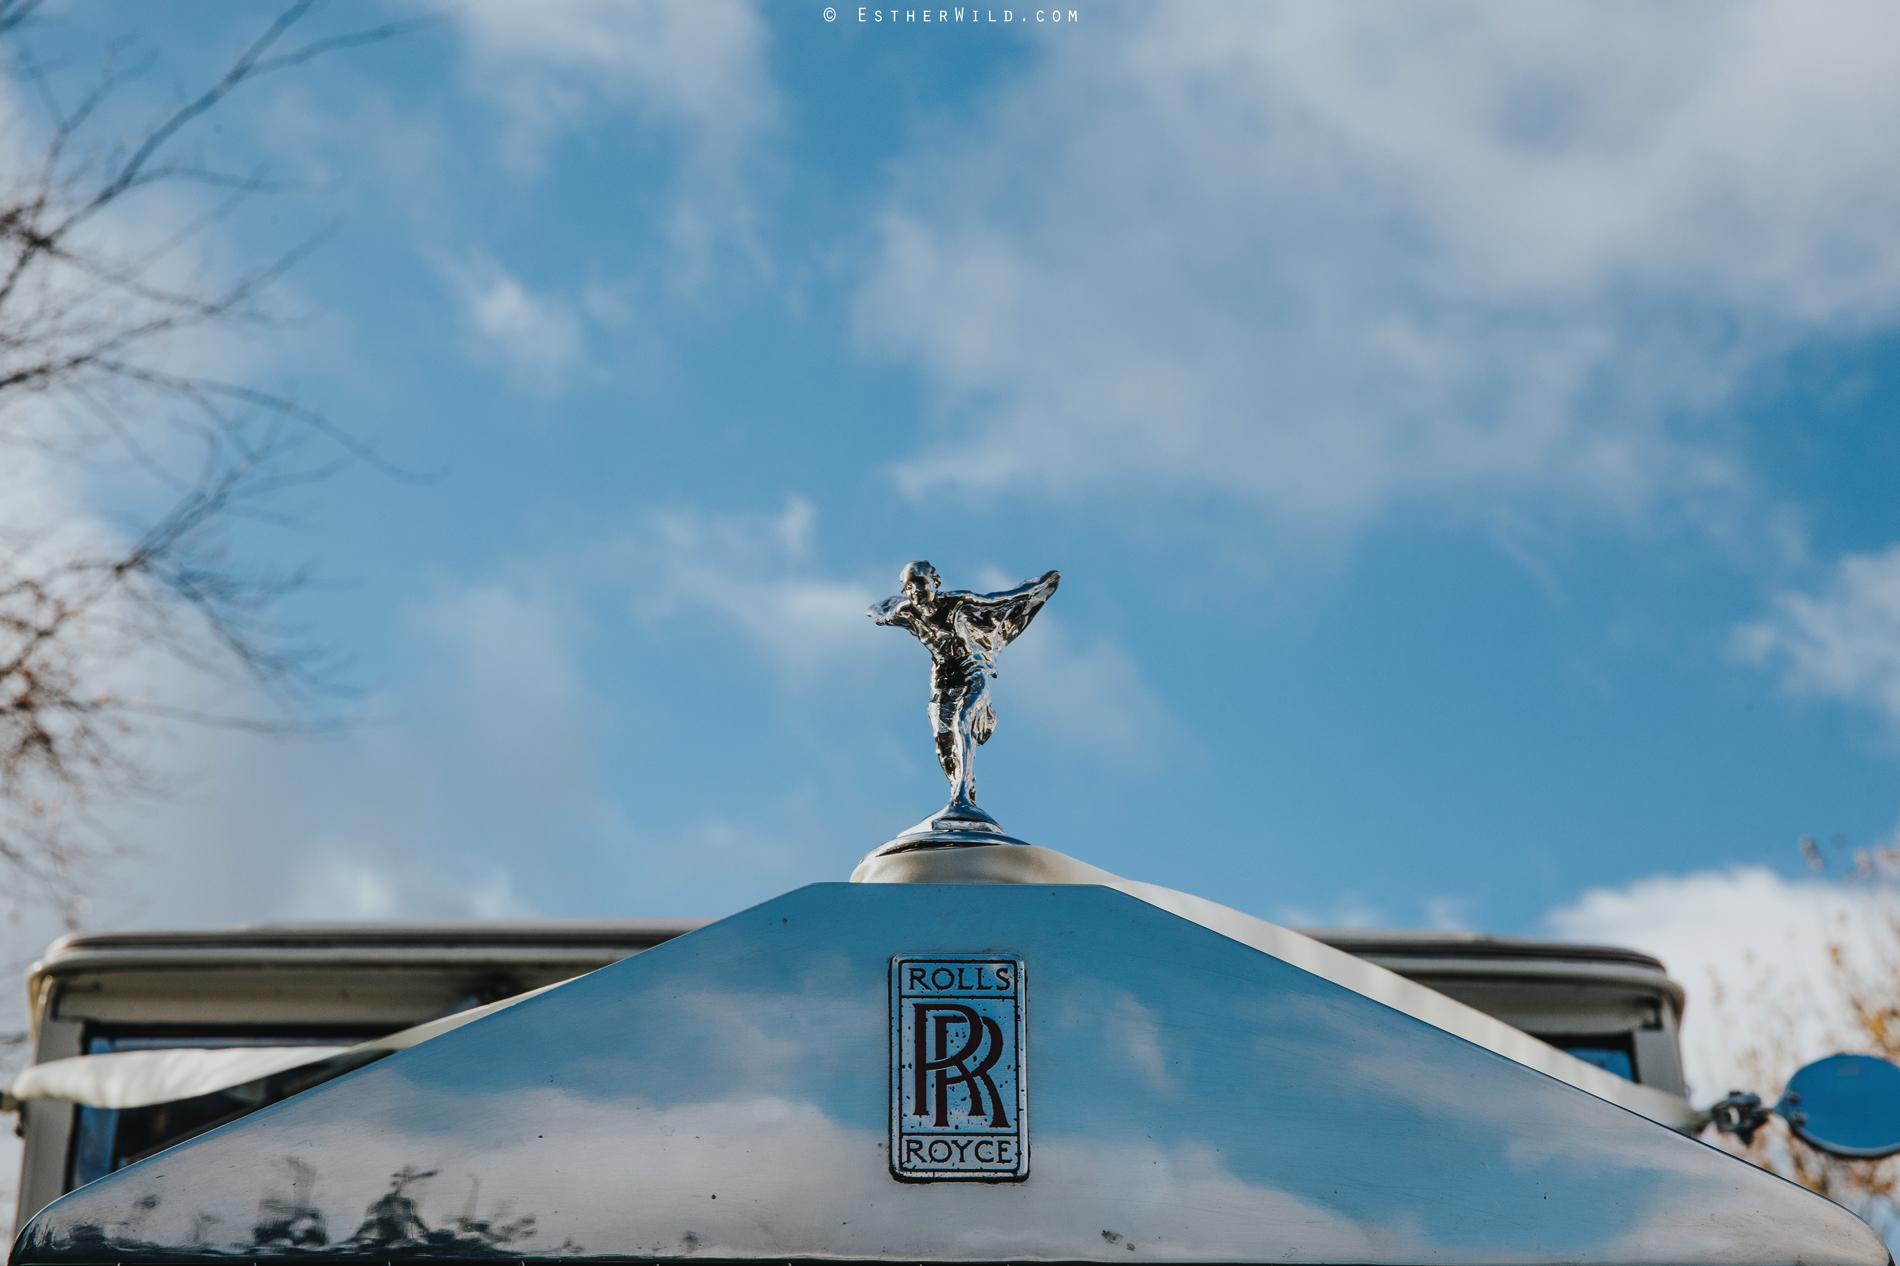 1117_Kings_Lynn_Town_Hall_Wedding_Esther_Wild_PhotographerIMG_0348.jpg